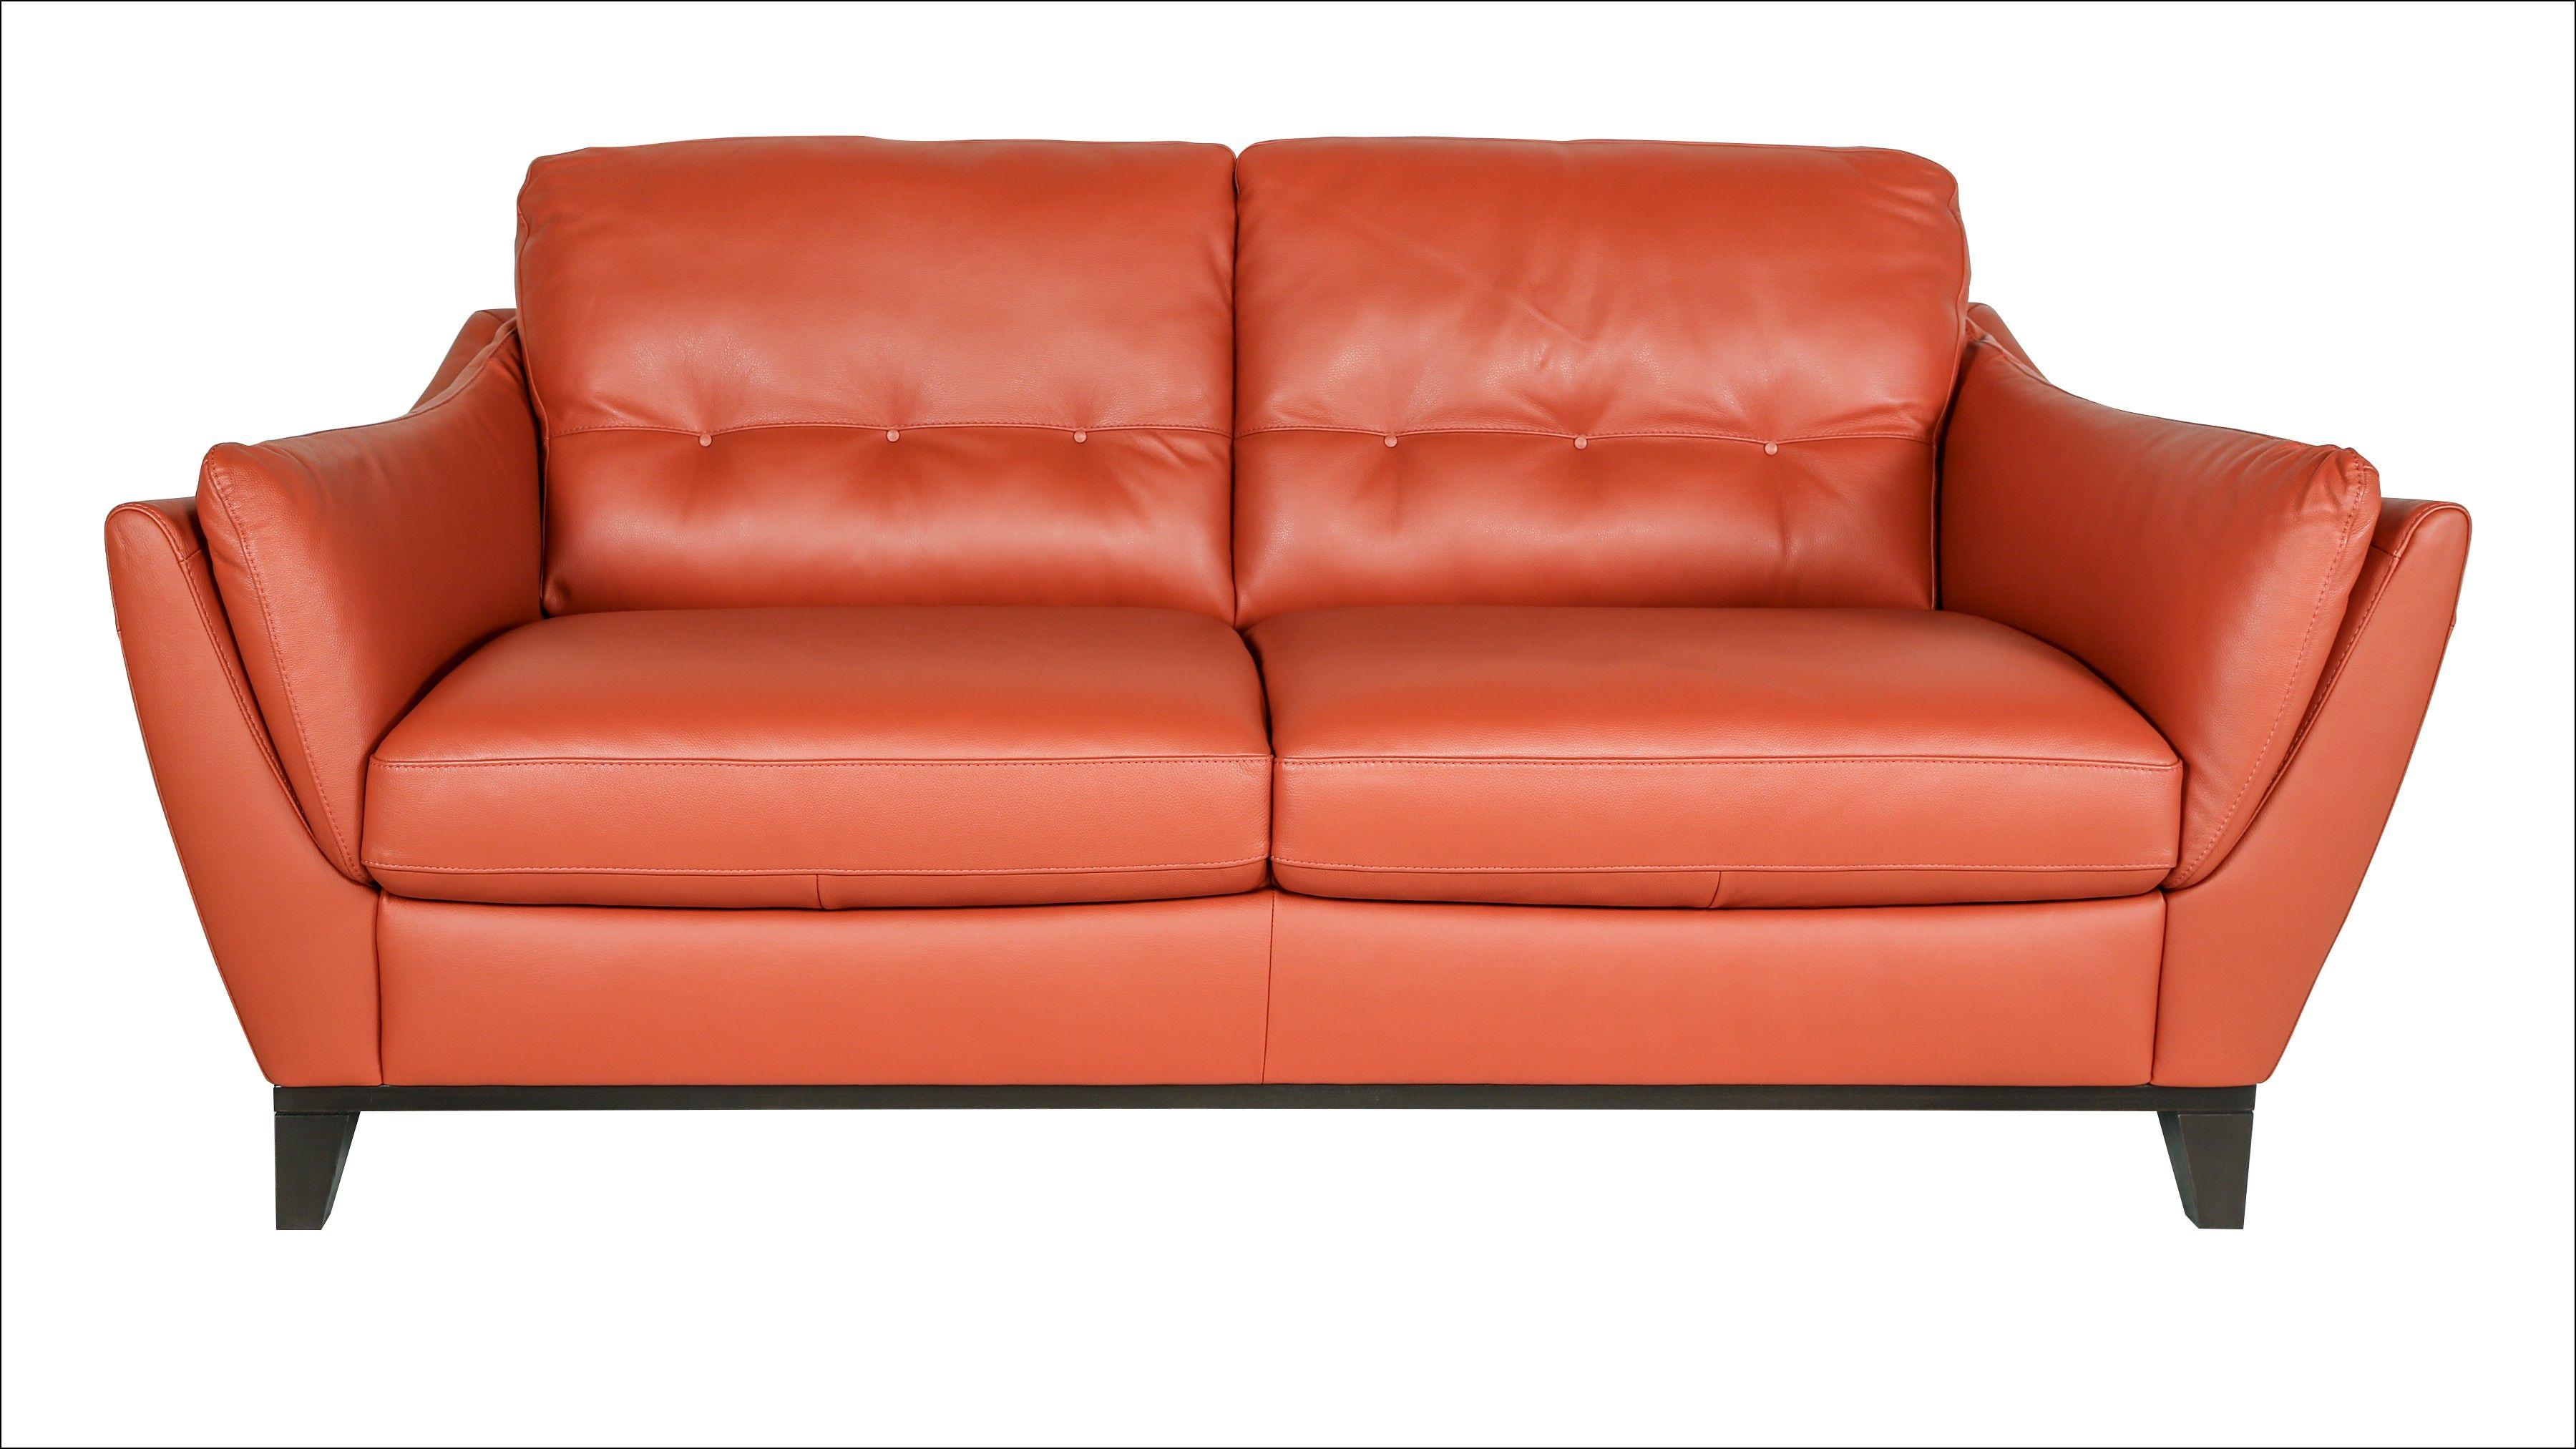 Terracotta Leather Sofa